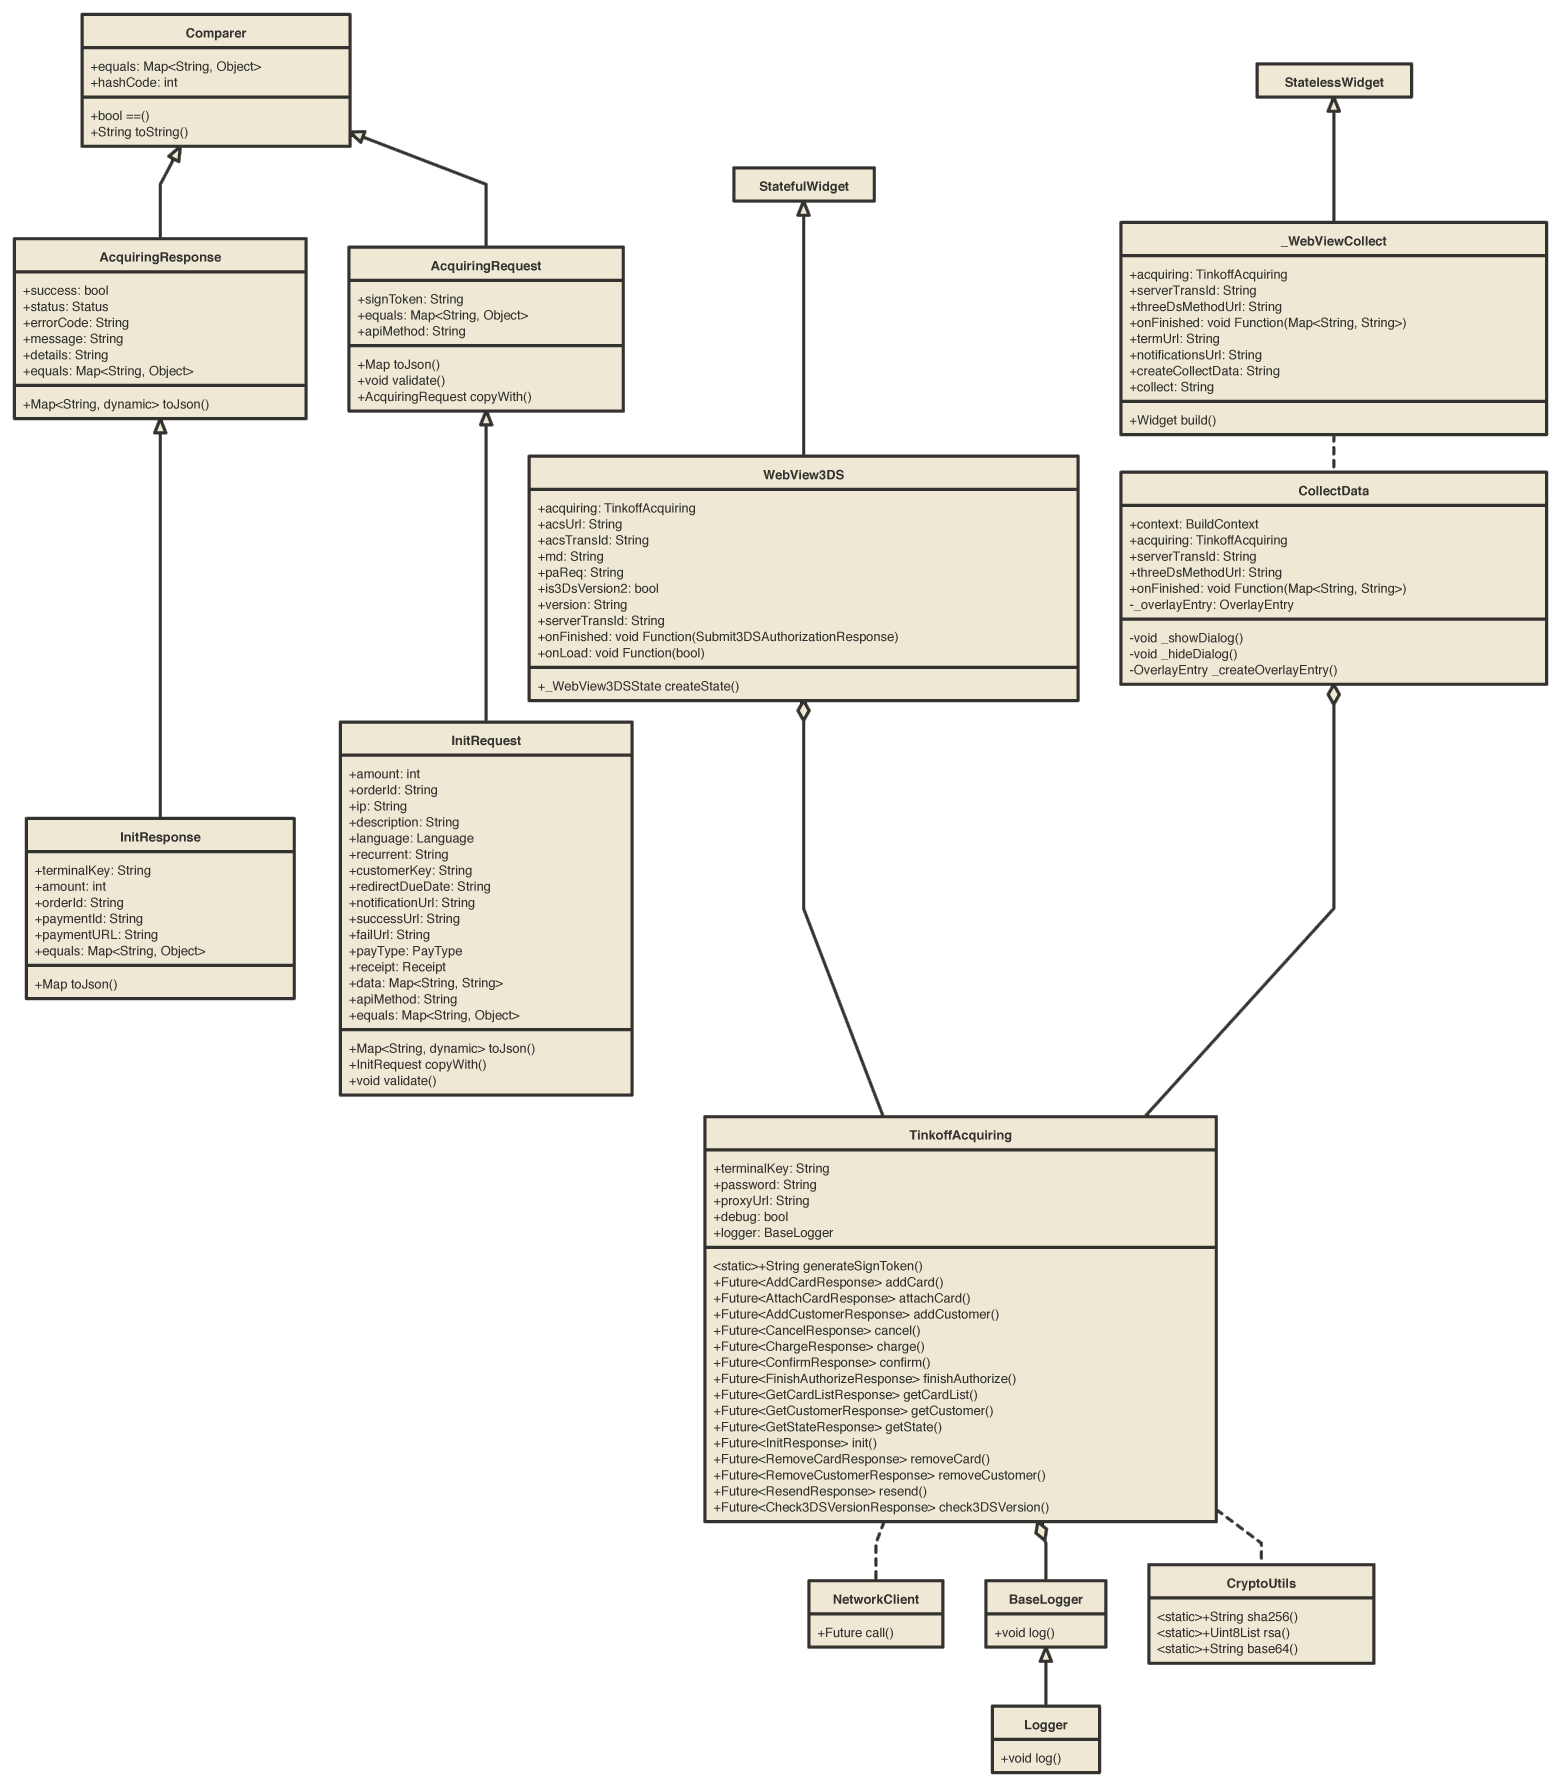 Диаграмма классов ядра библиотеки